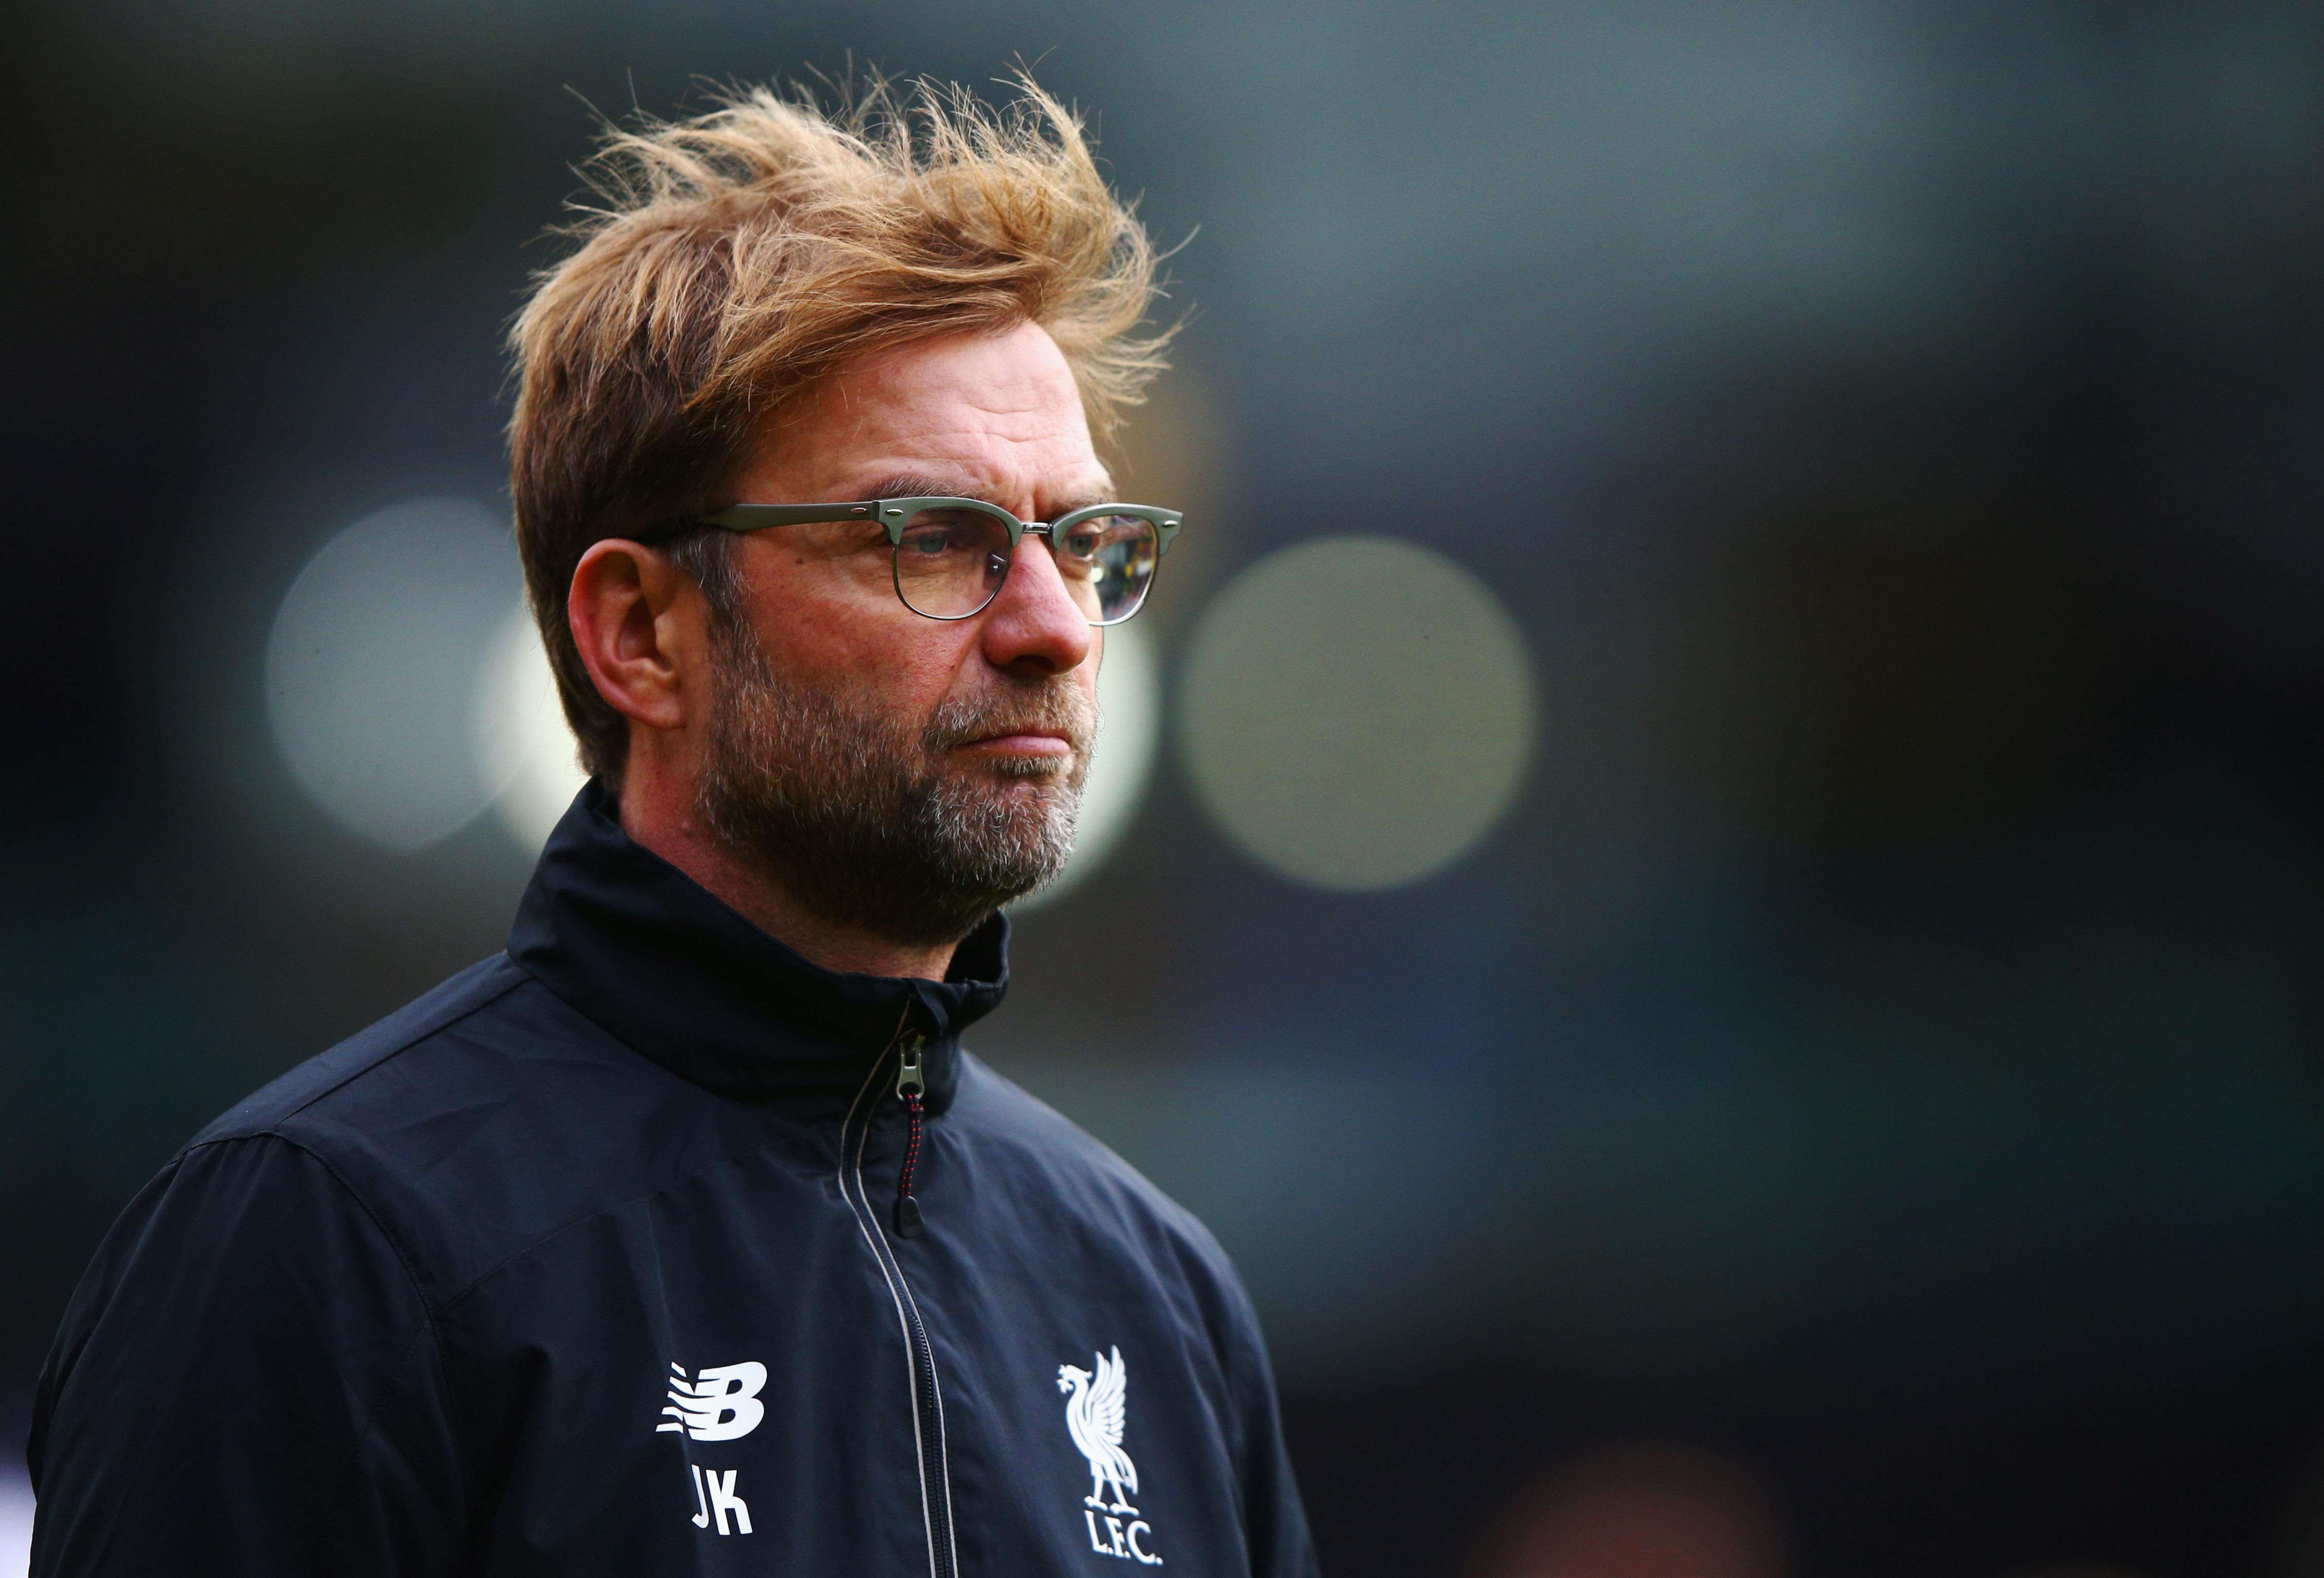 Liverpool eye Neven Subotic or Joel Matip transfers after Martin Skrtel injury – report